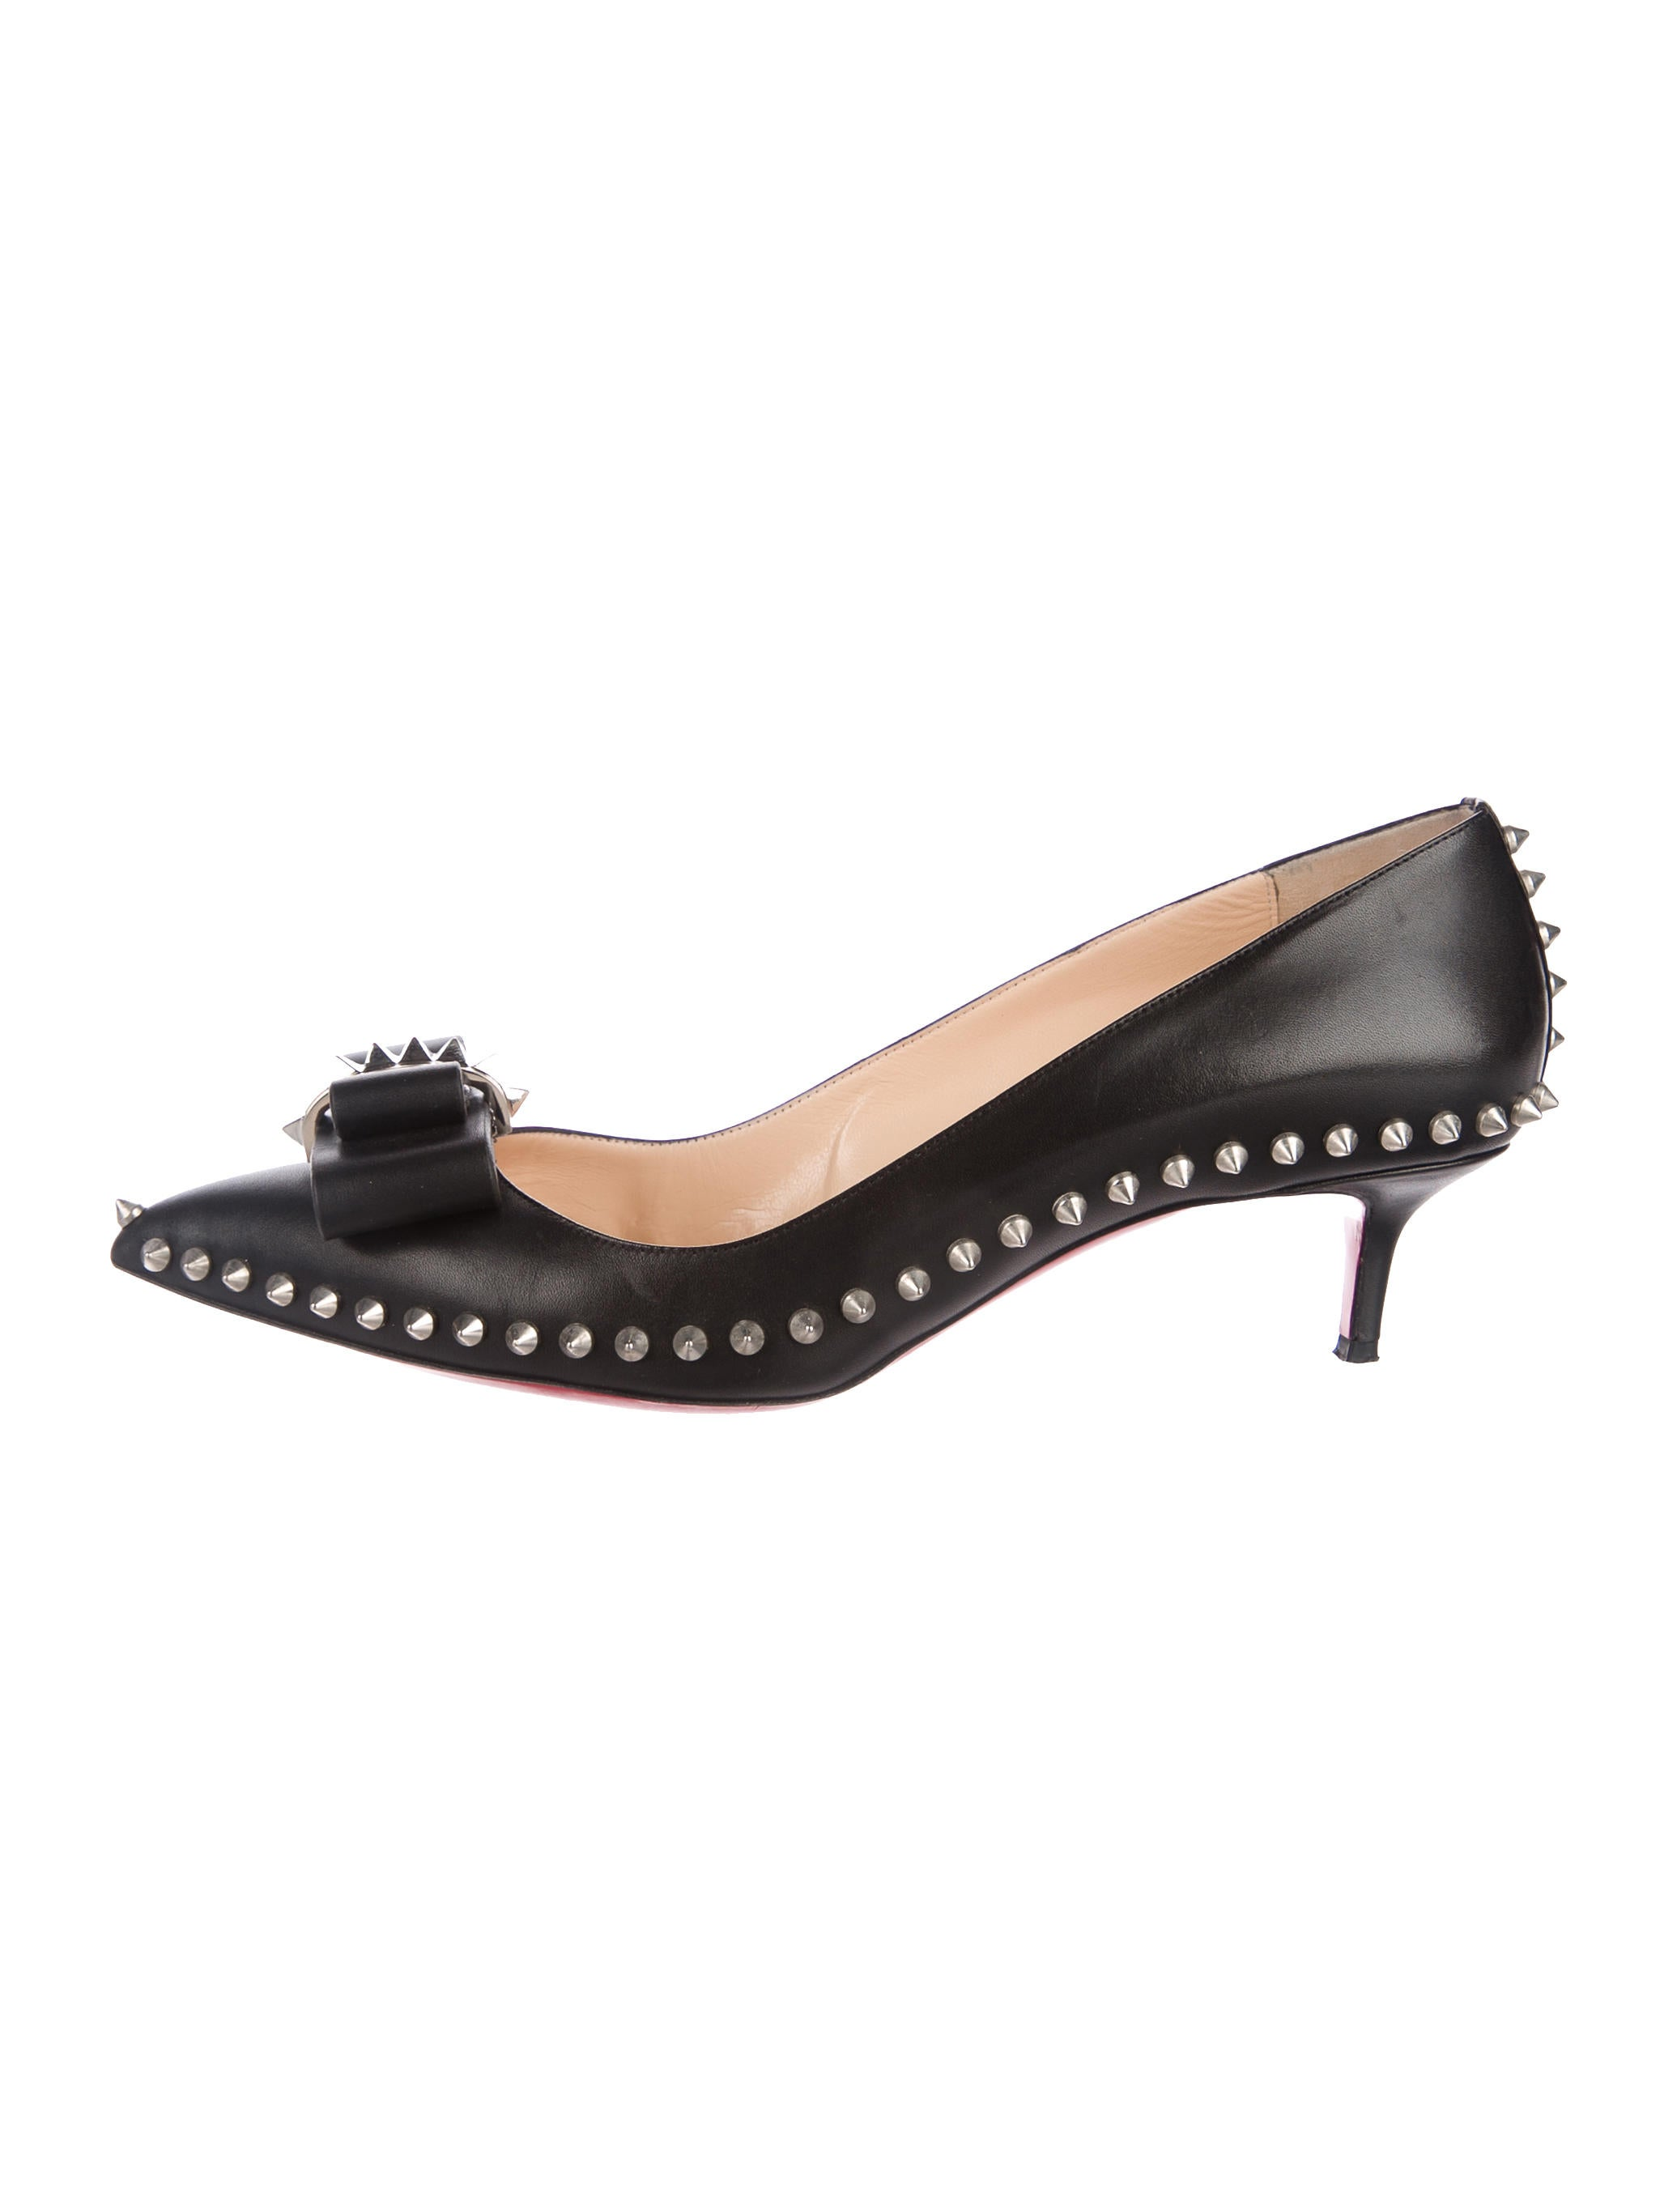 sports shoes 0c4ef 45846 Christian Louboutin Lucifer Bow Pumps - Shoes - CHT86270 ...